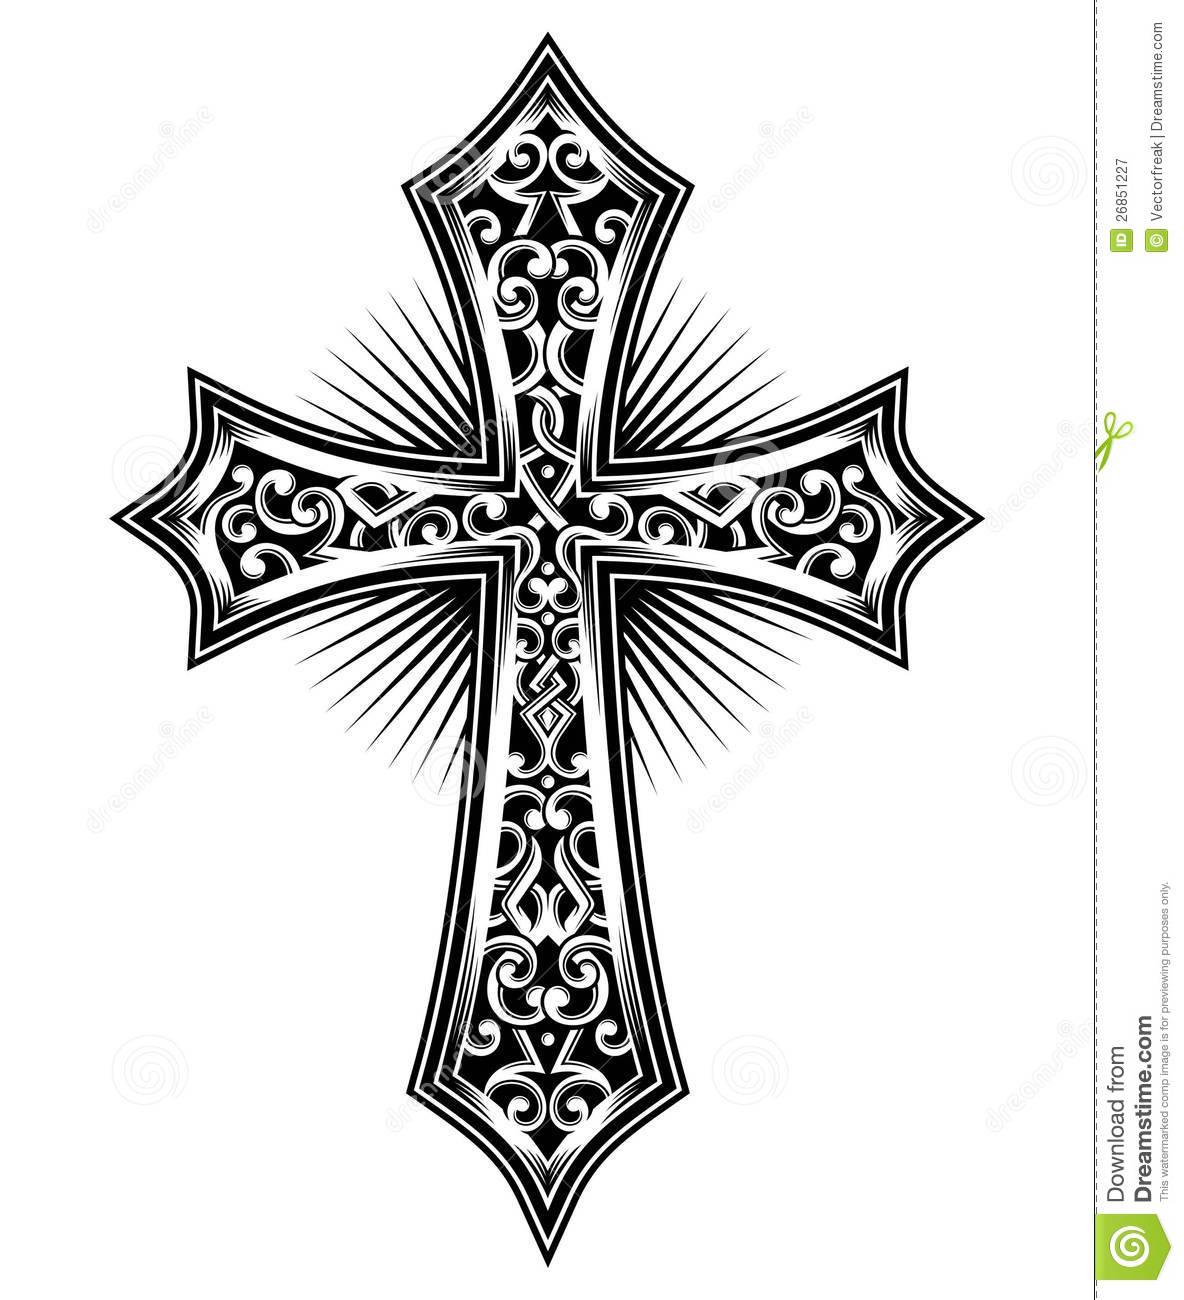 16 t shirt graphics vectors cross images free vector for Cross clipart